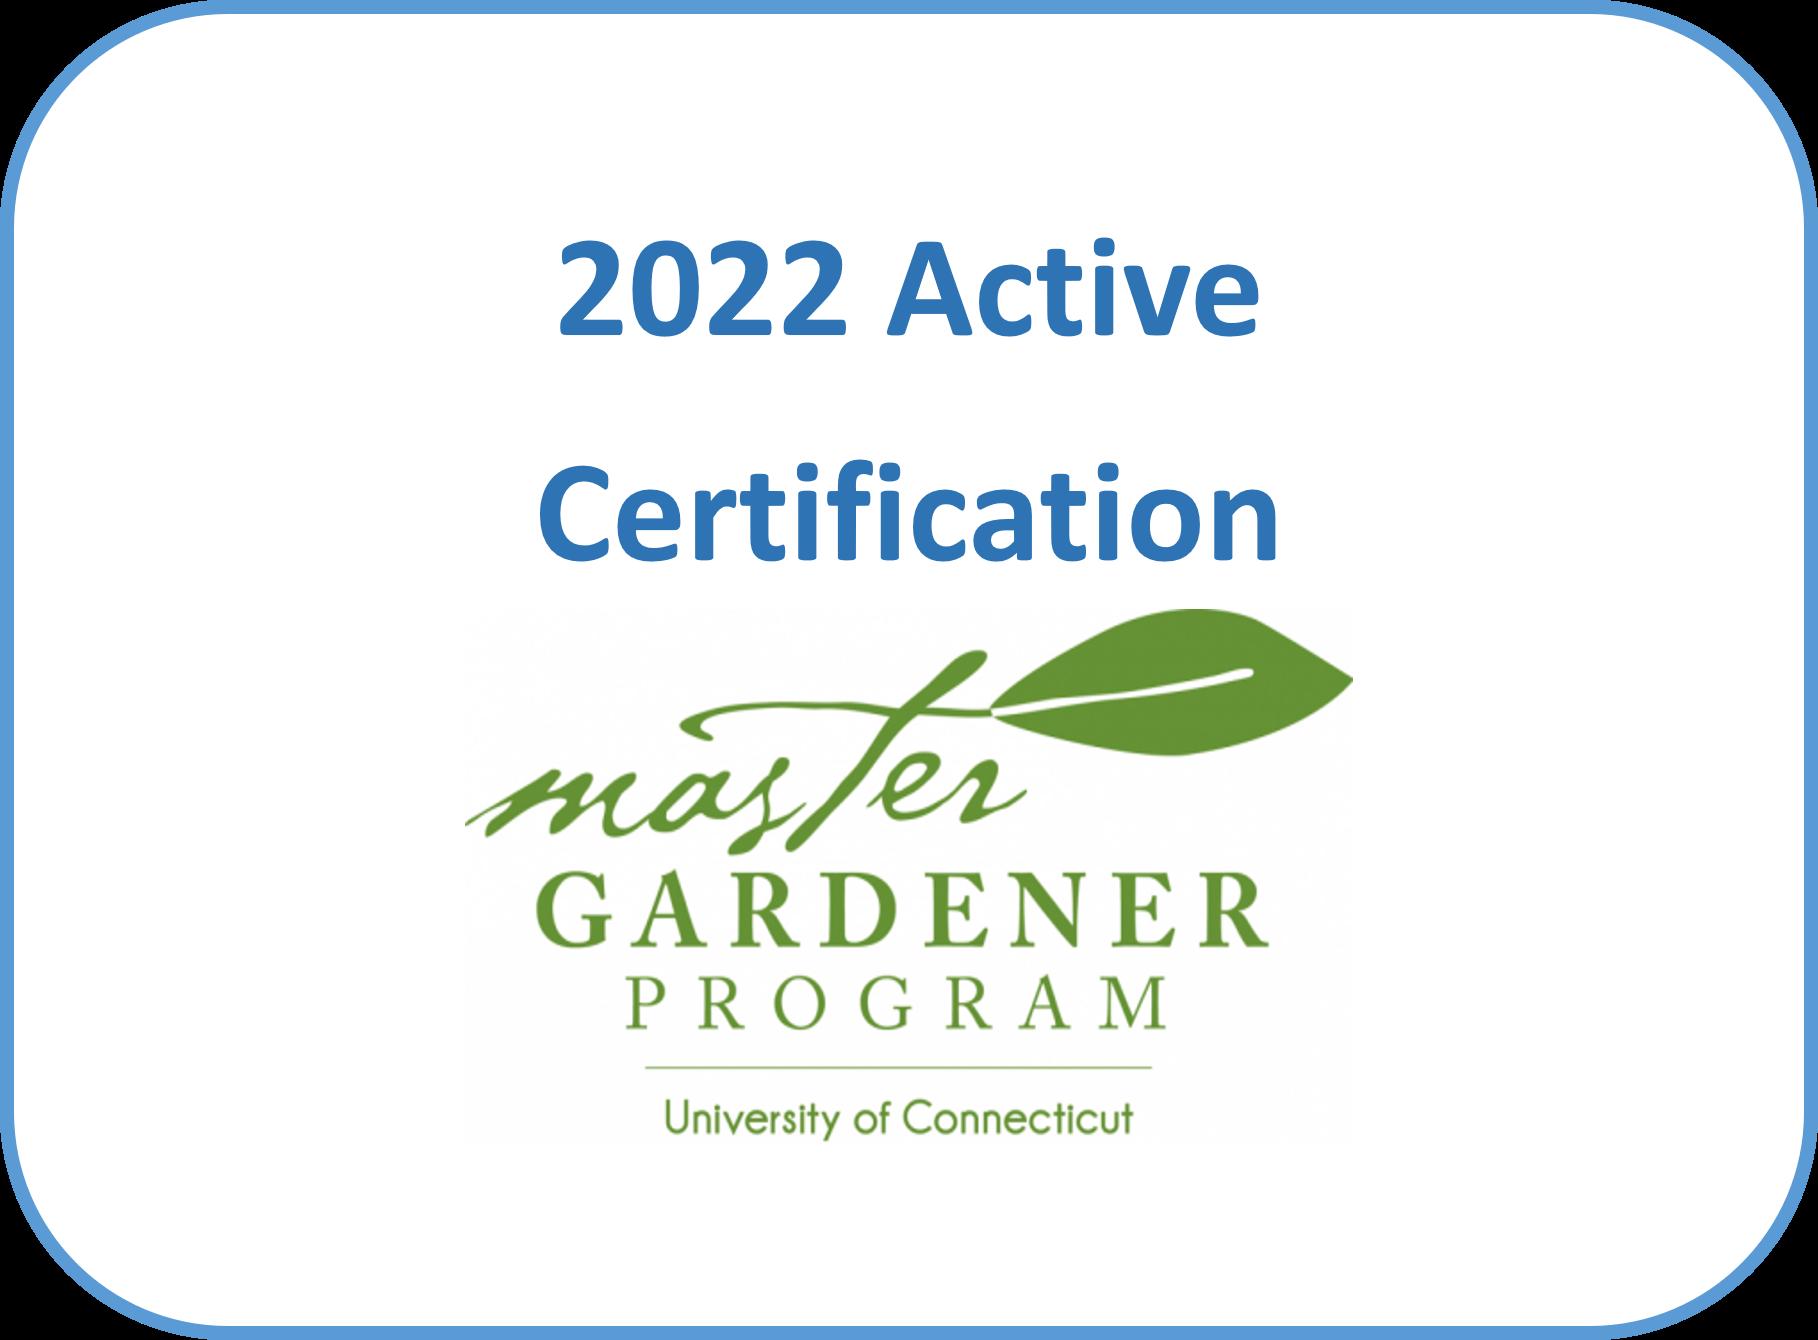 Active Certification 2022 - New Haven